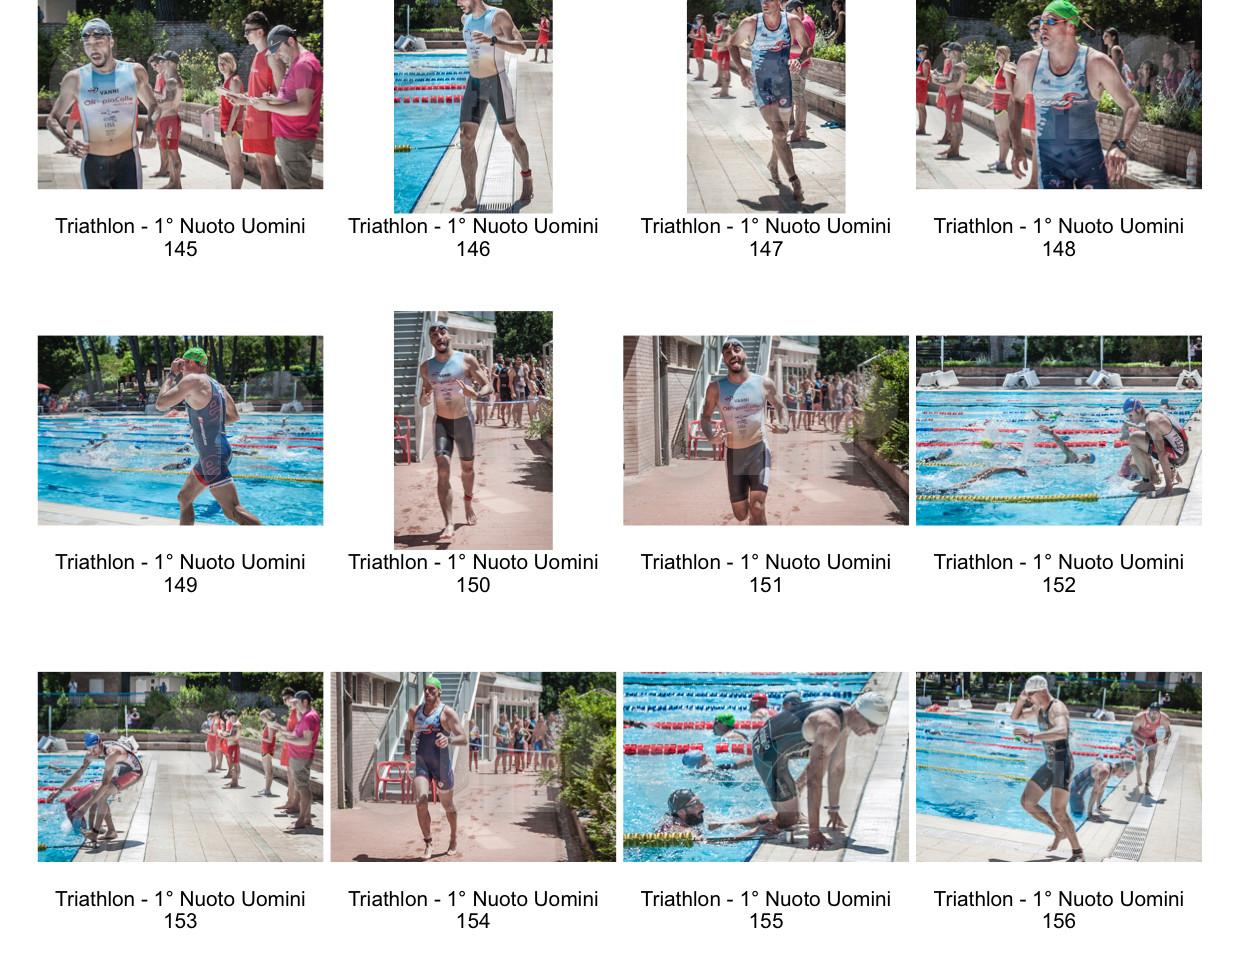 Triathlon_V.Elsa_-_1°_Frazione_Nuoto_Uomini_-08.jpg